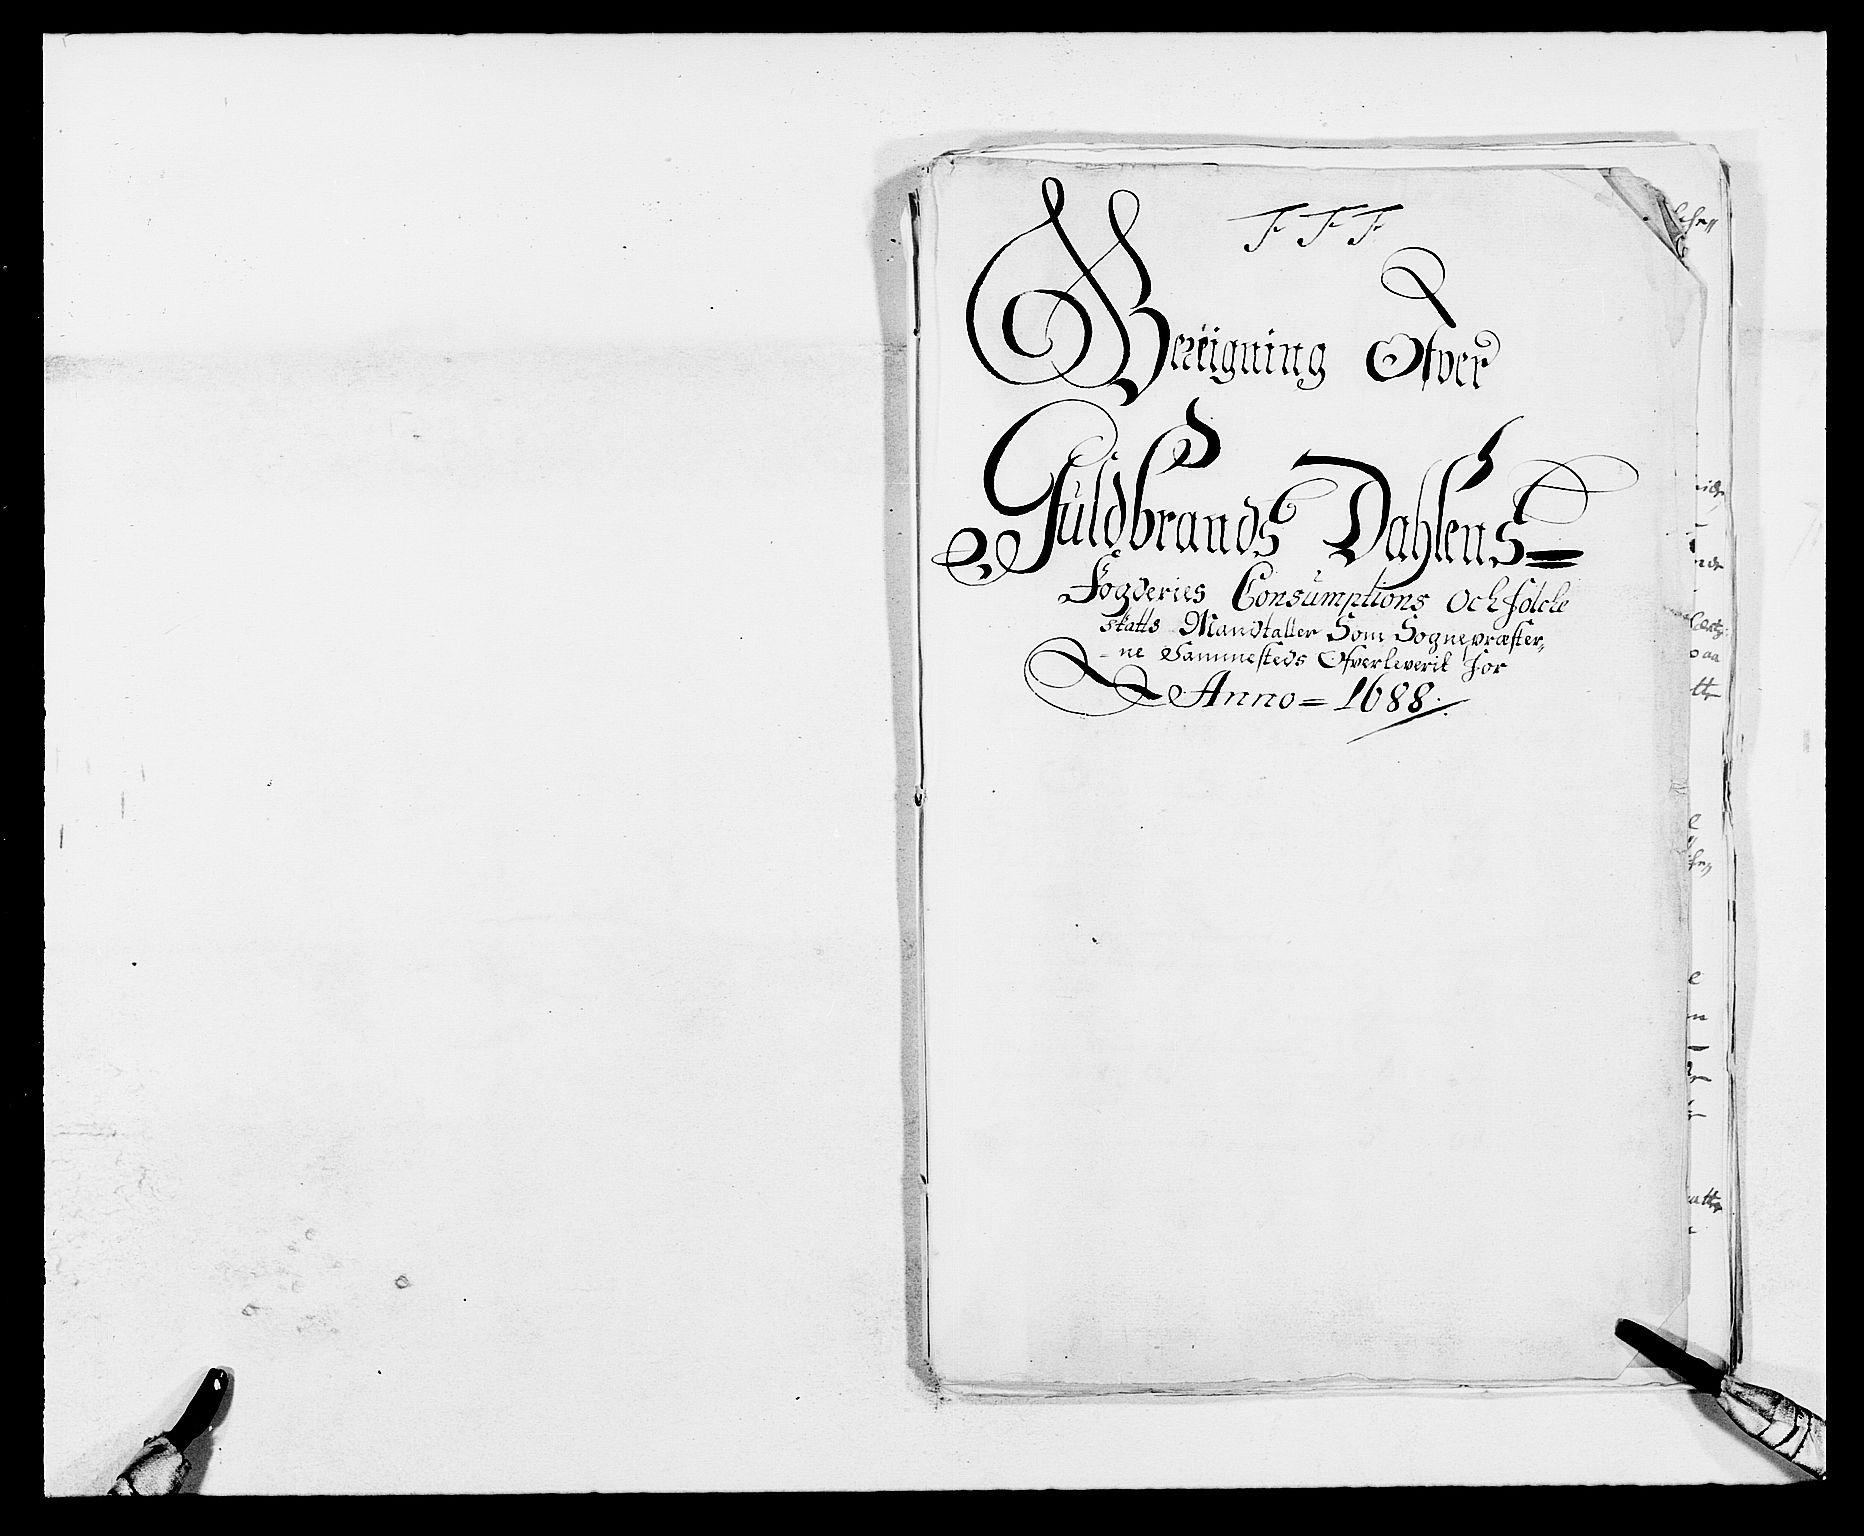 RA, Rentekammeret inntil 1814, Reviderte regnskaper, Fogderegnskap, R17/L1163: Fogderegnskap Gudbrandsdal, 1682-1689, s. 274